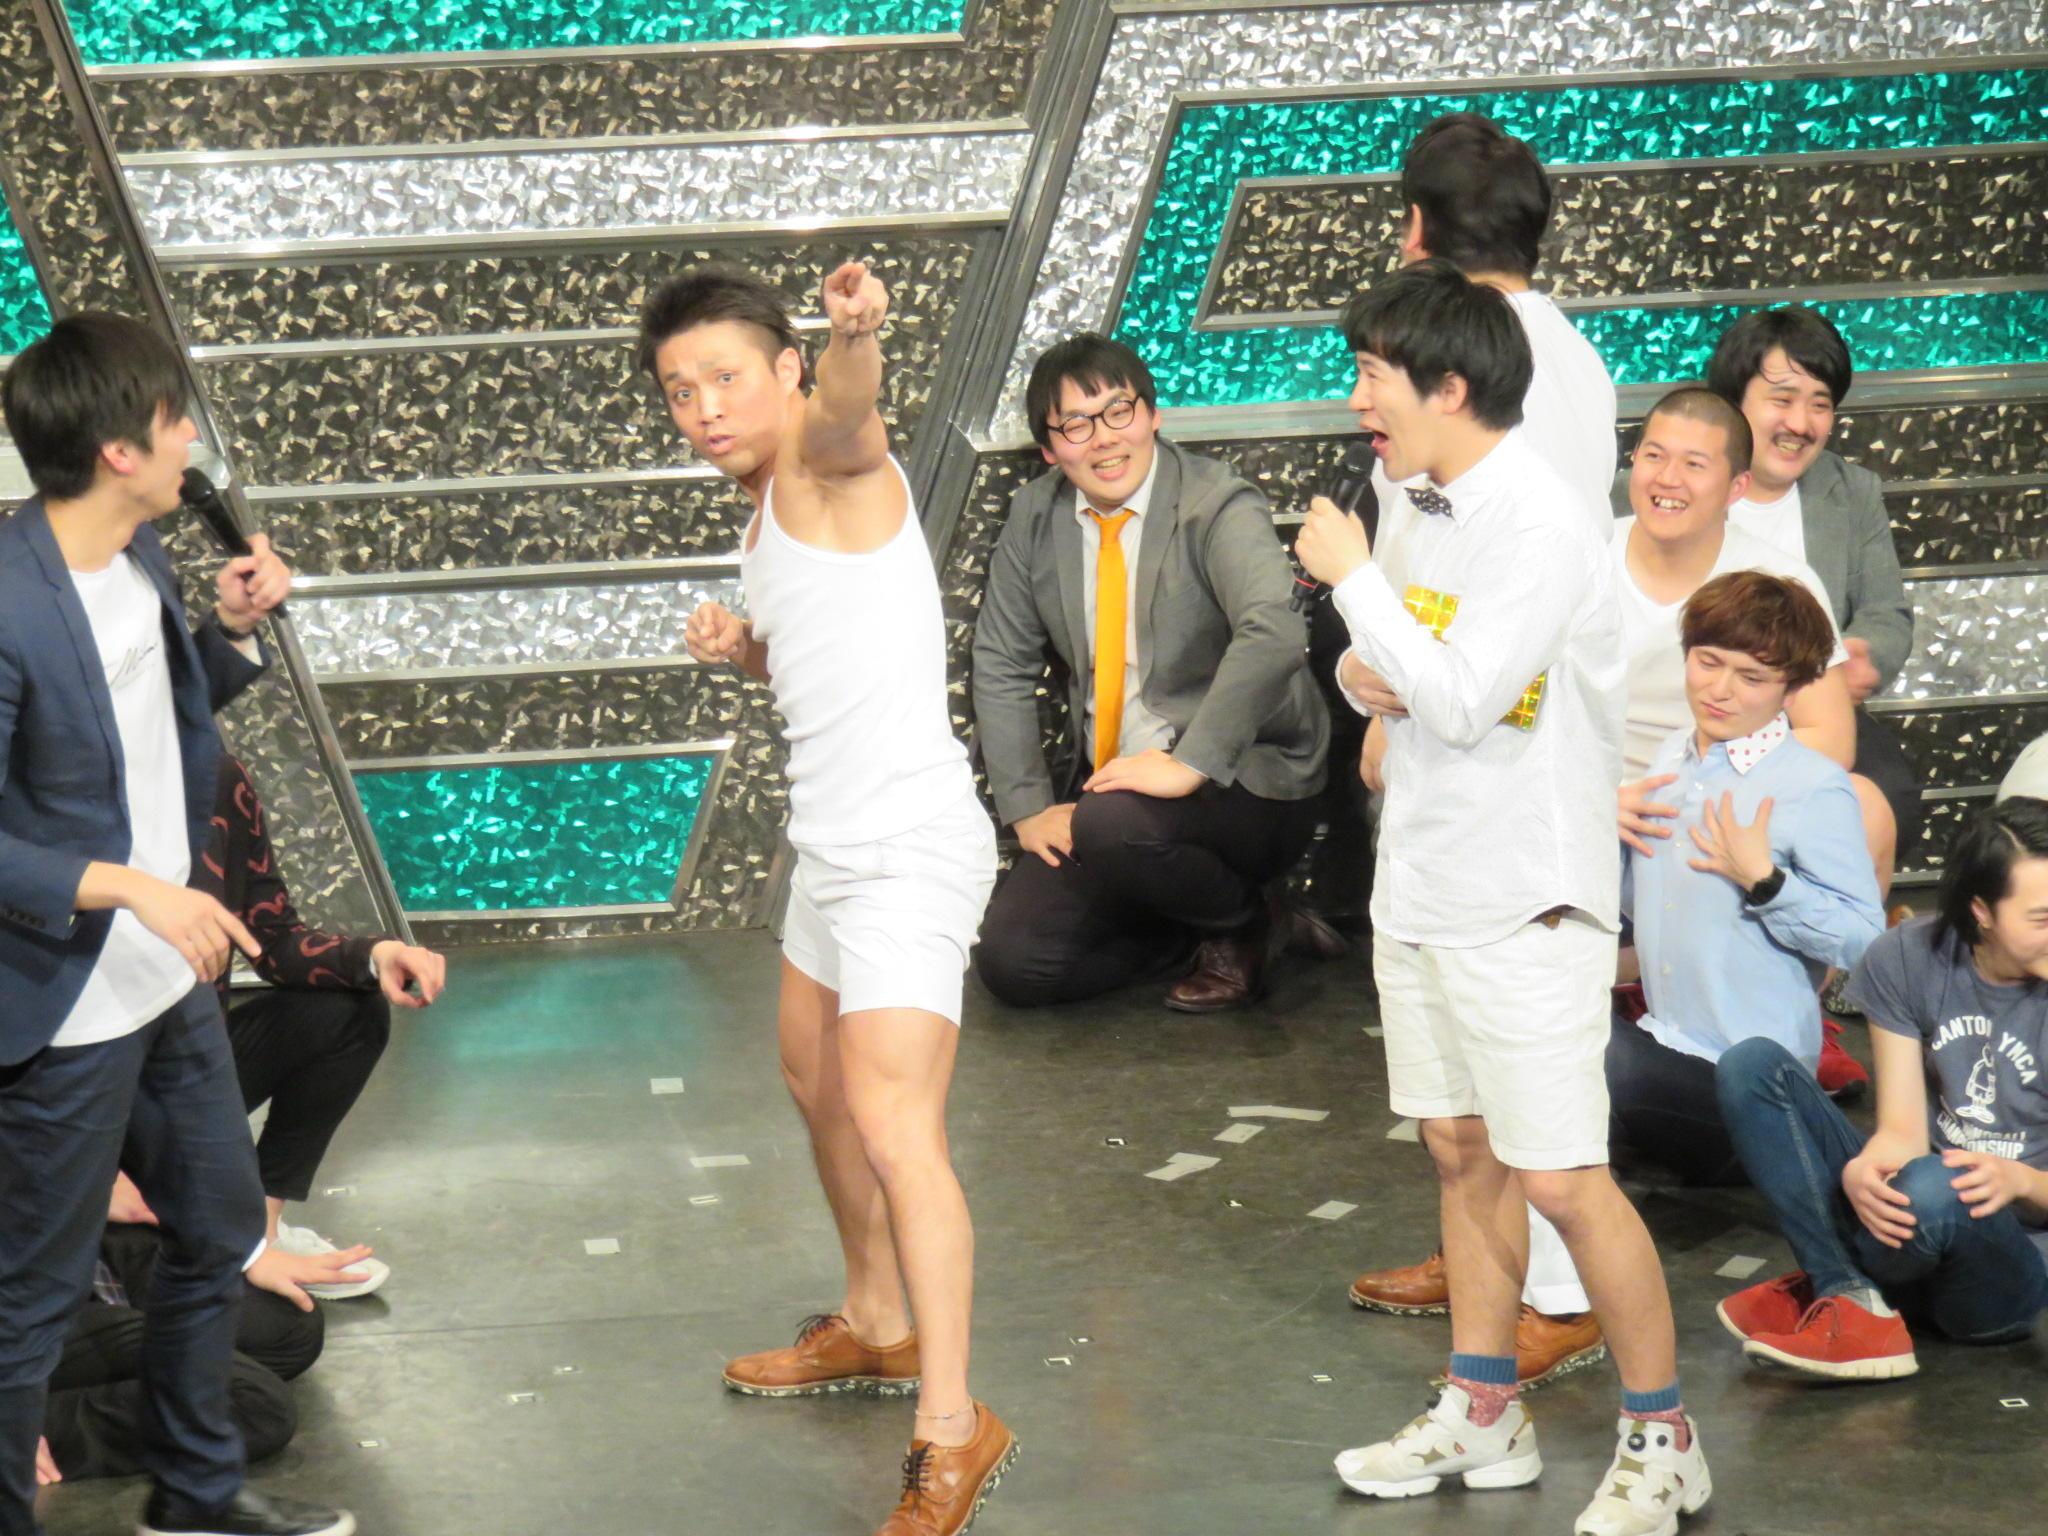 http://news.yoshimoto.co.jp/20160229144917-92e492d0fad55acc2d99540ec49dab970f2b514f.jpg